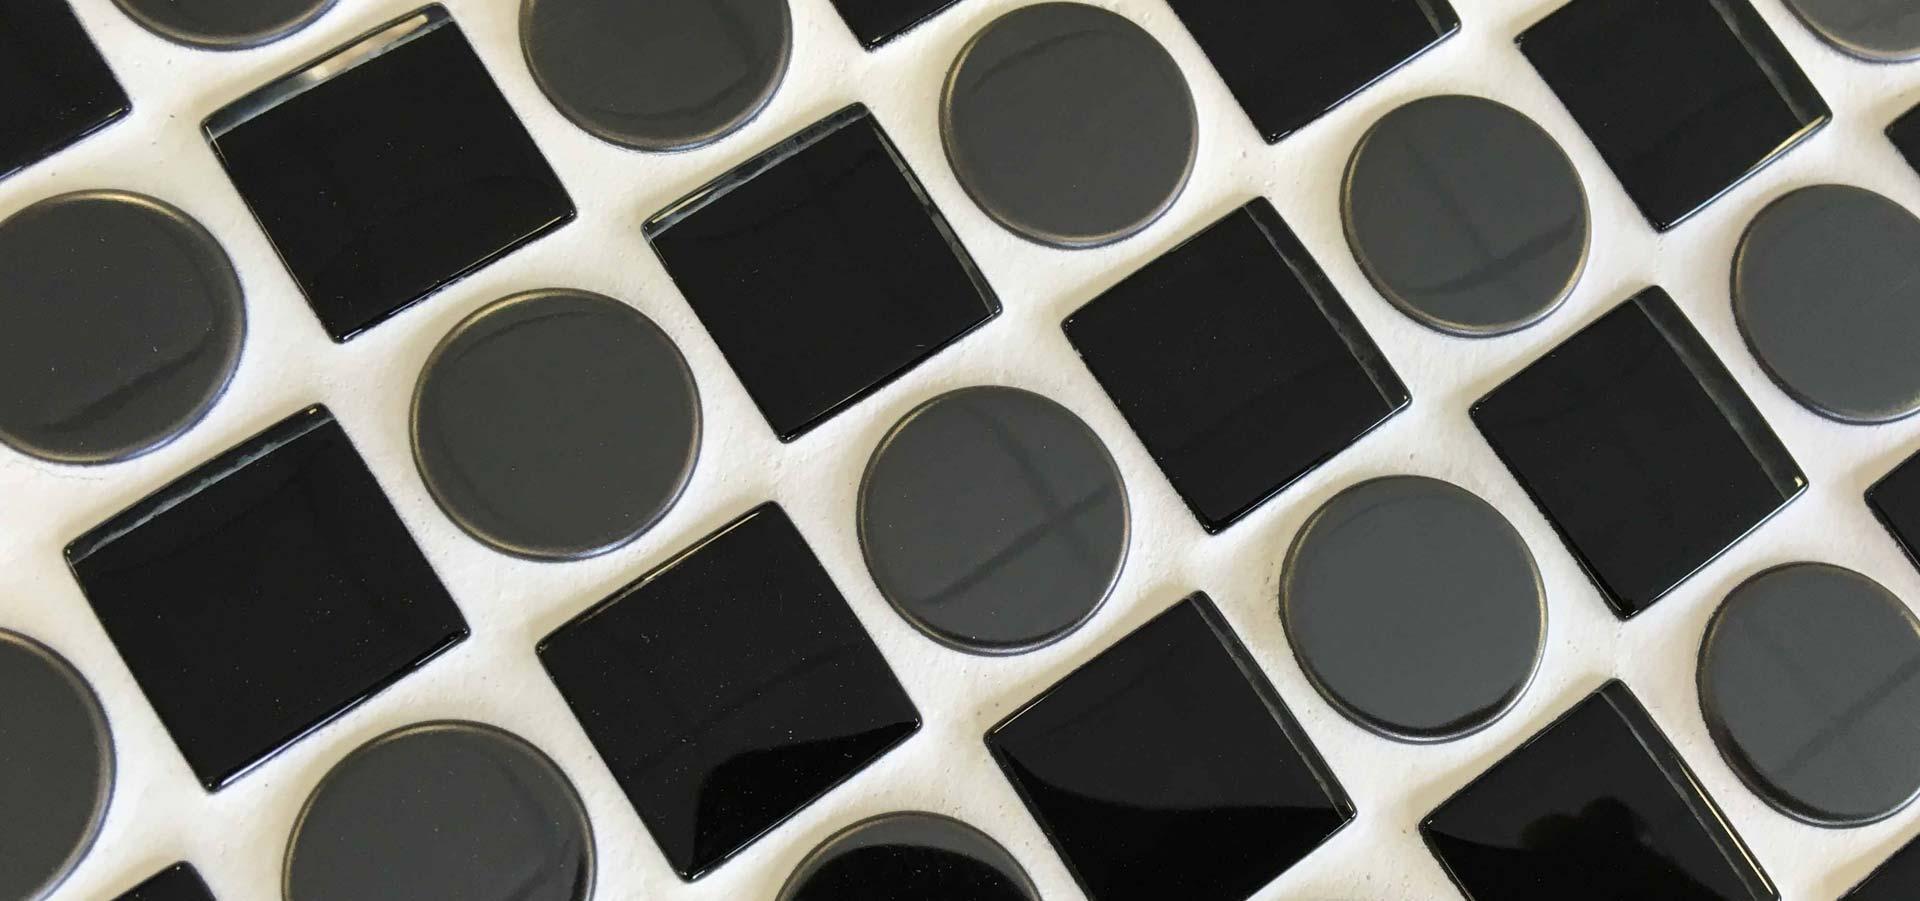 Tiles Checkers Black